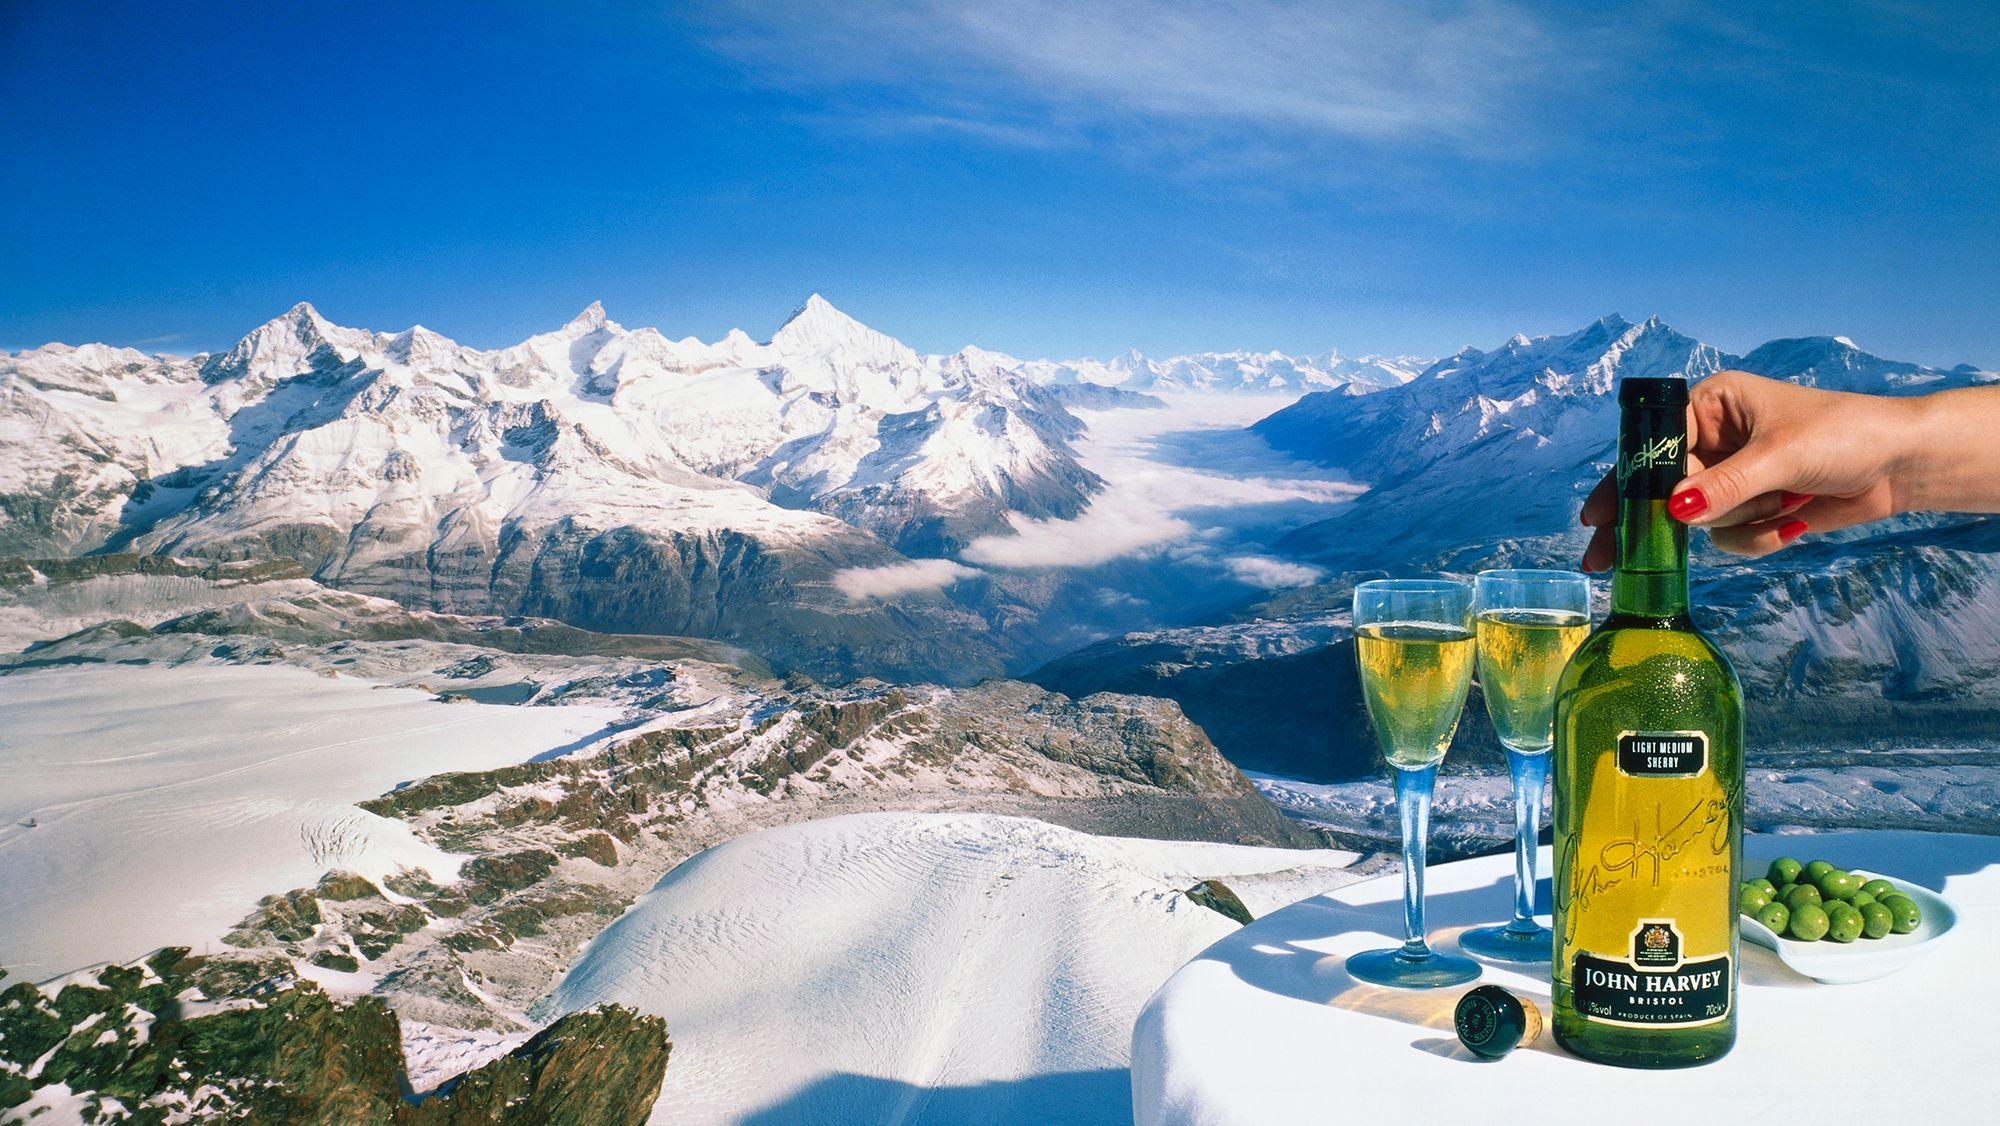 Alpine location photographer